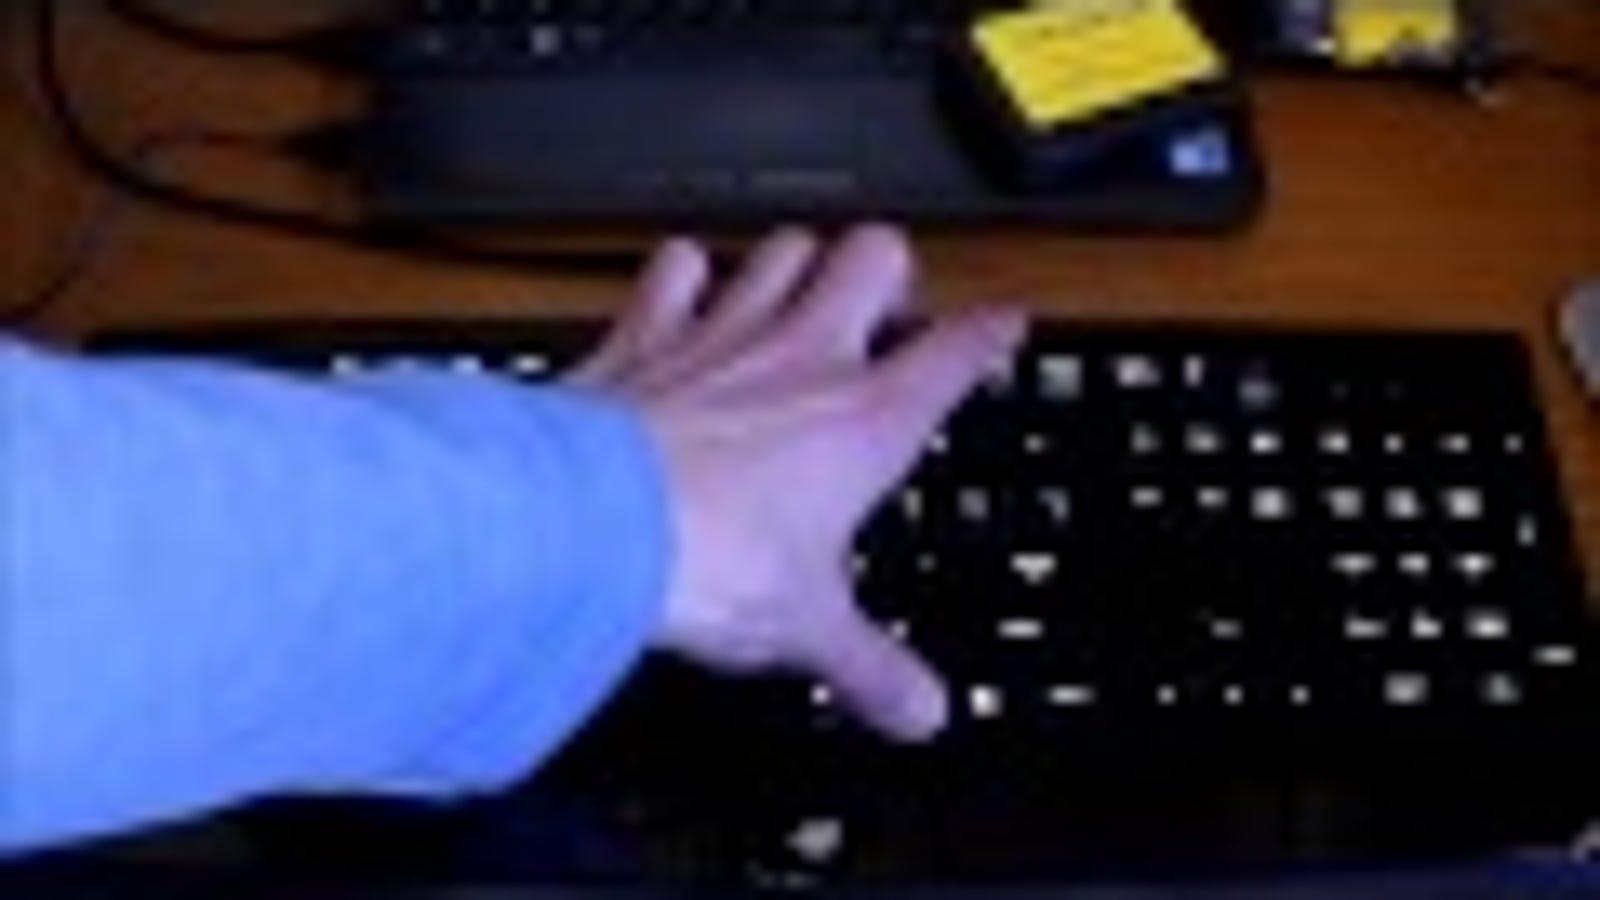 Add Custom Backlighting to Your Keyboard